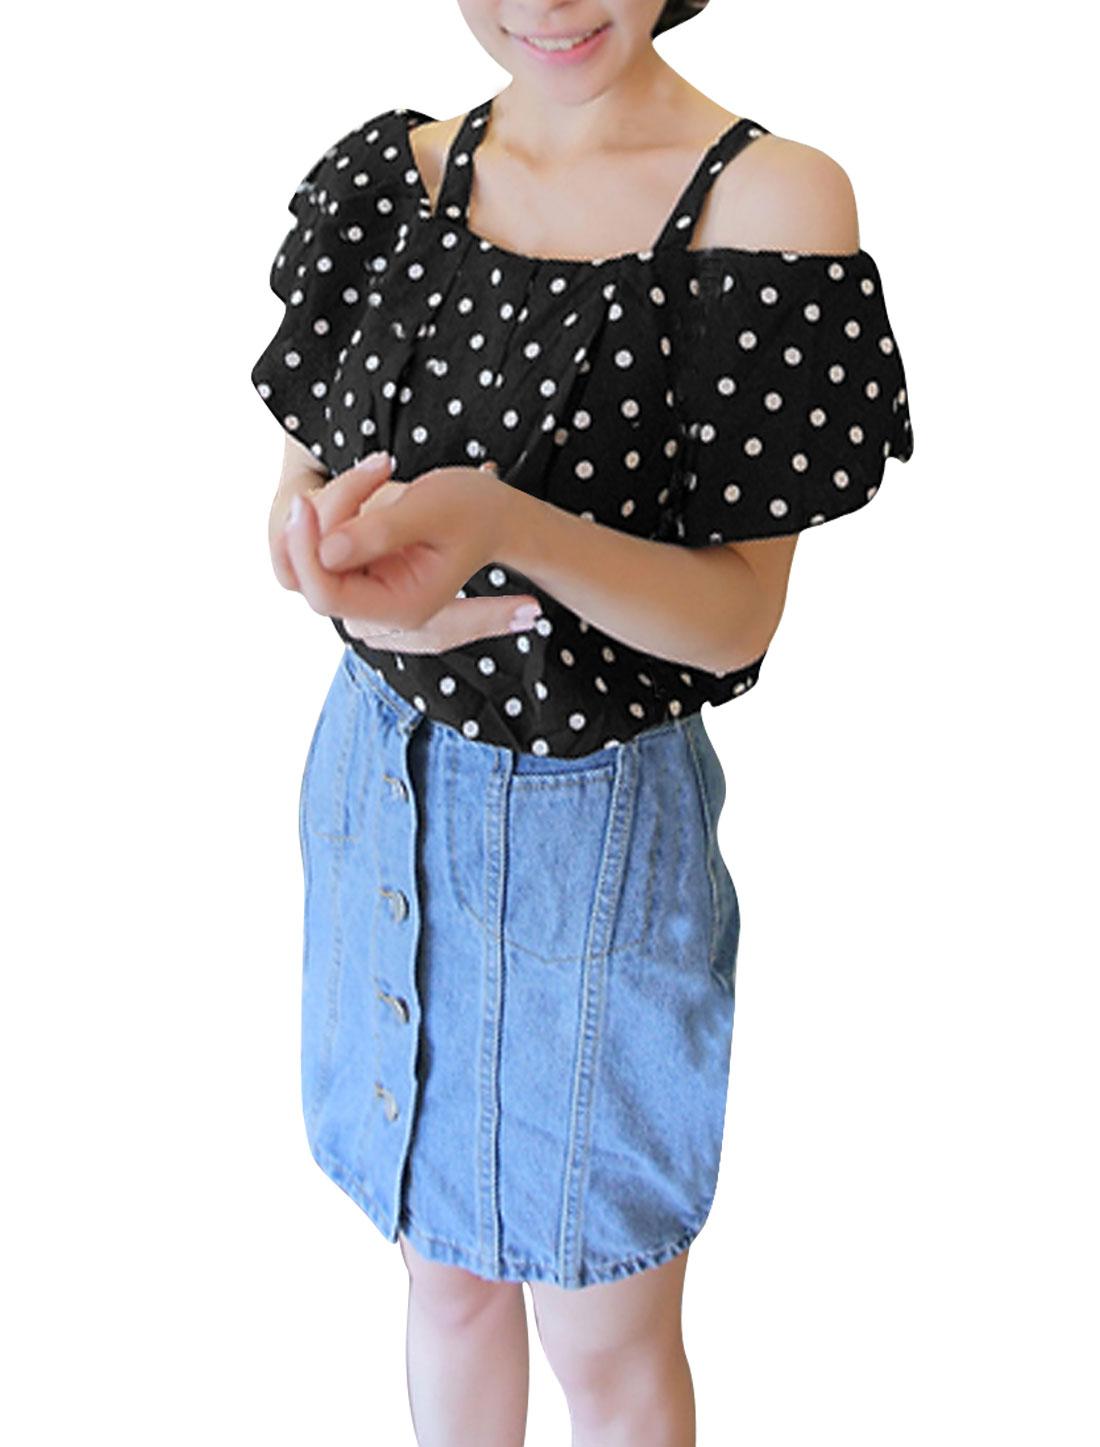 Lady Dots Prints Black Falbala Off-shoulder Chiffon Top S